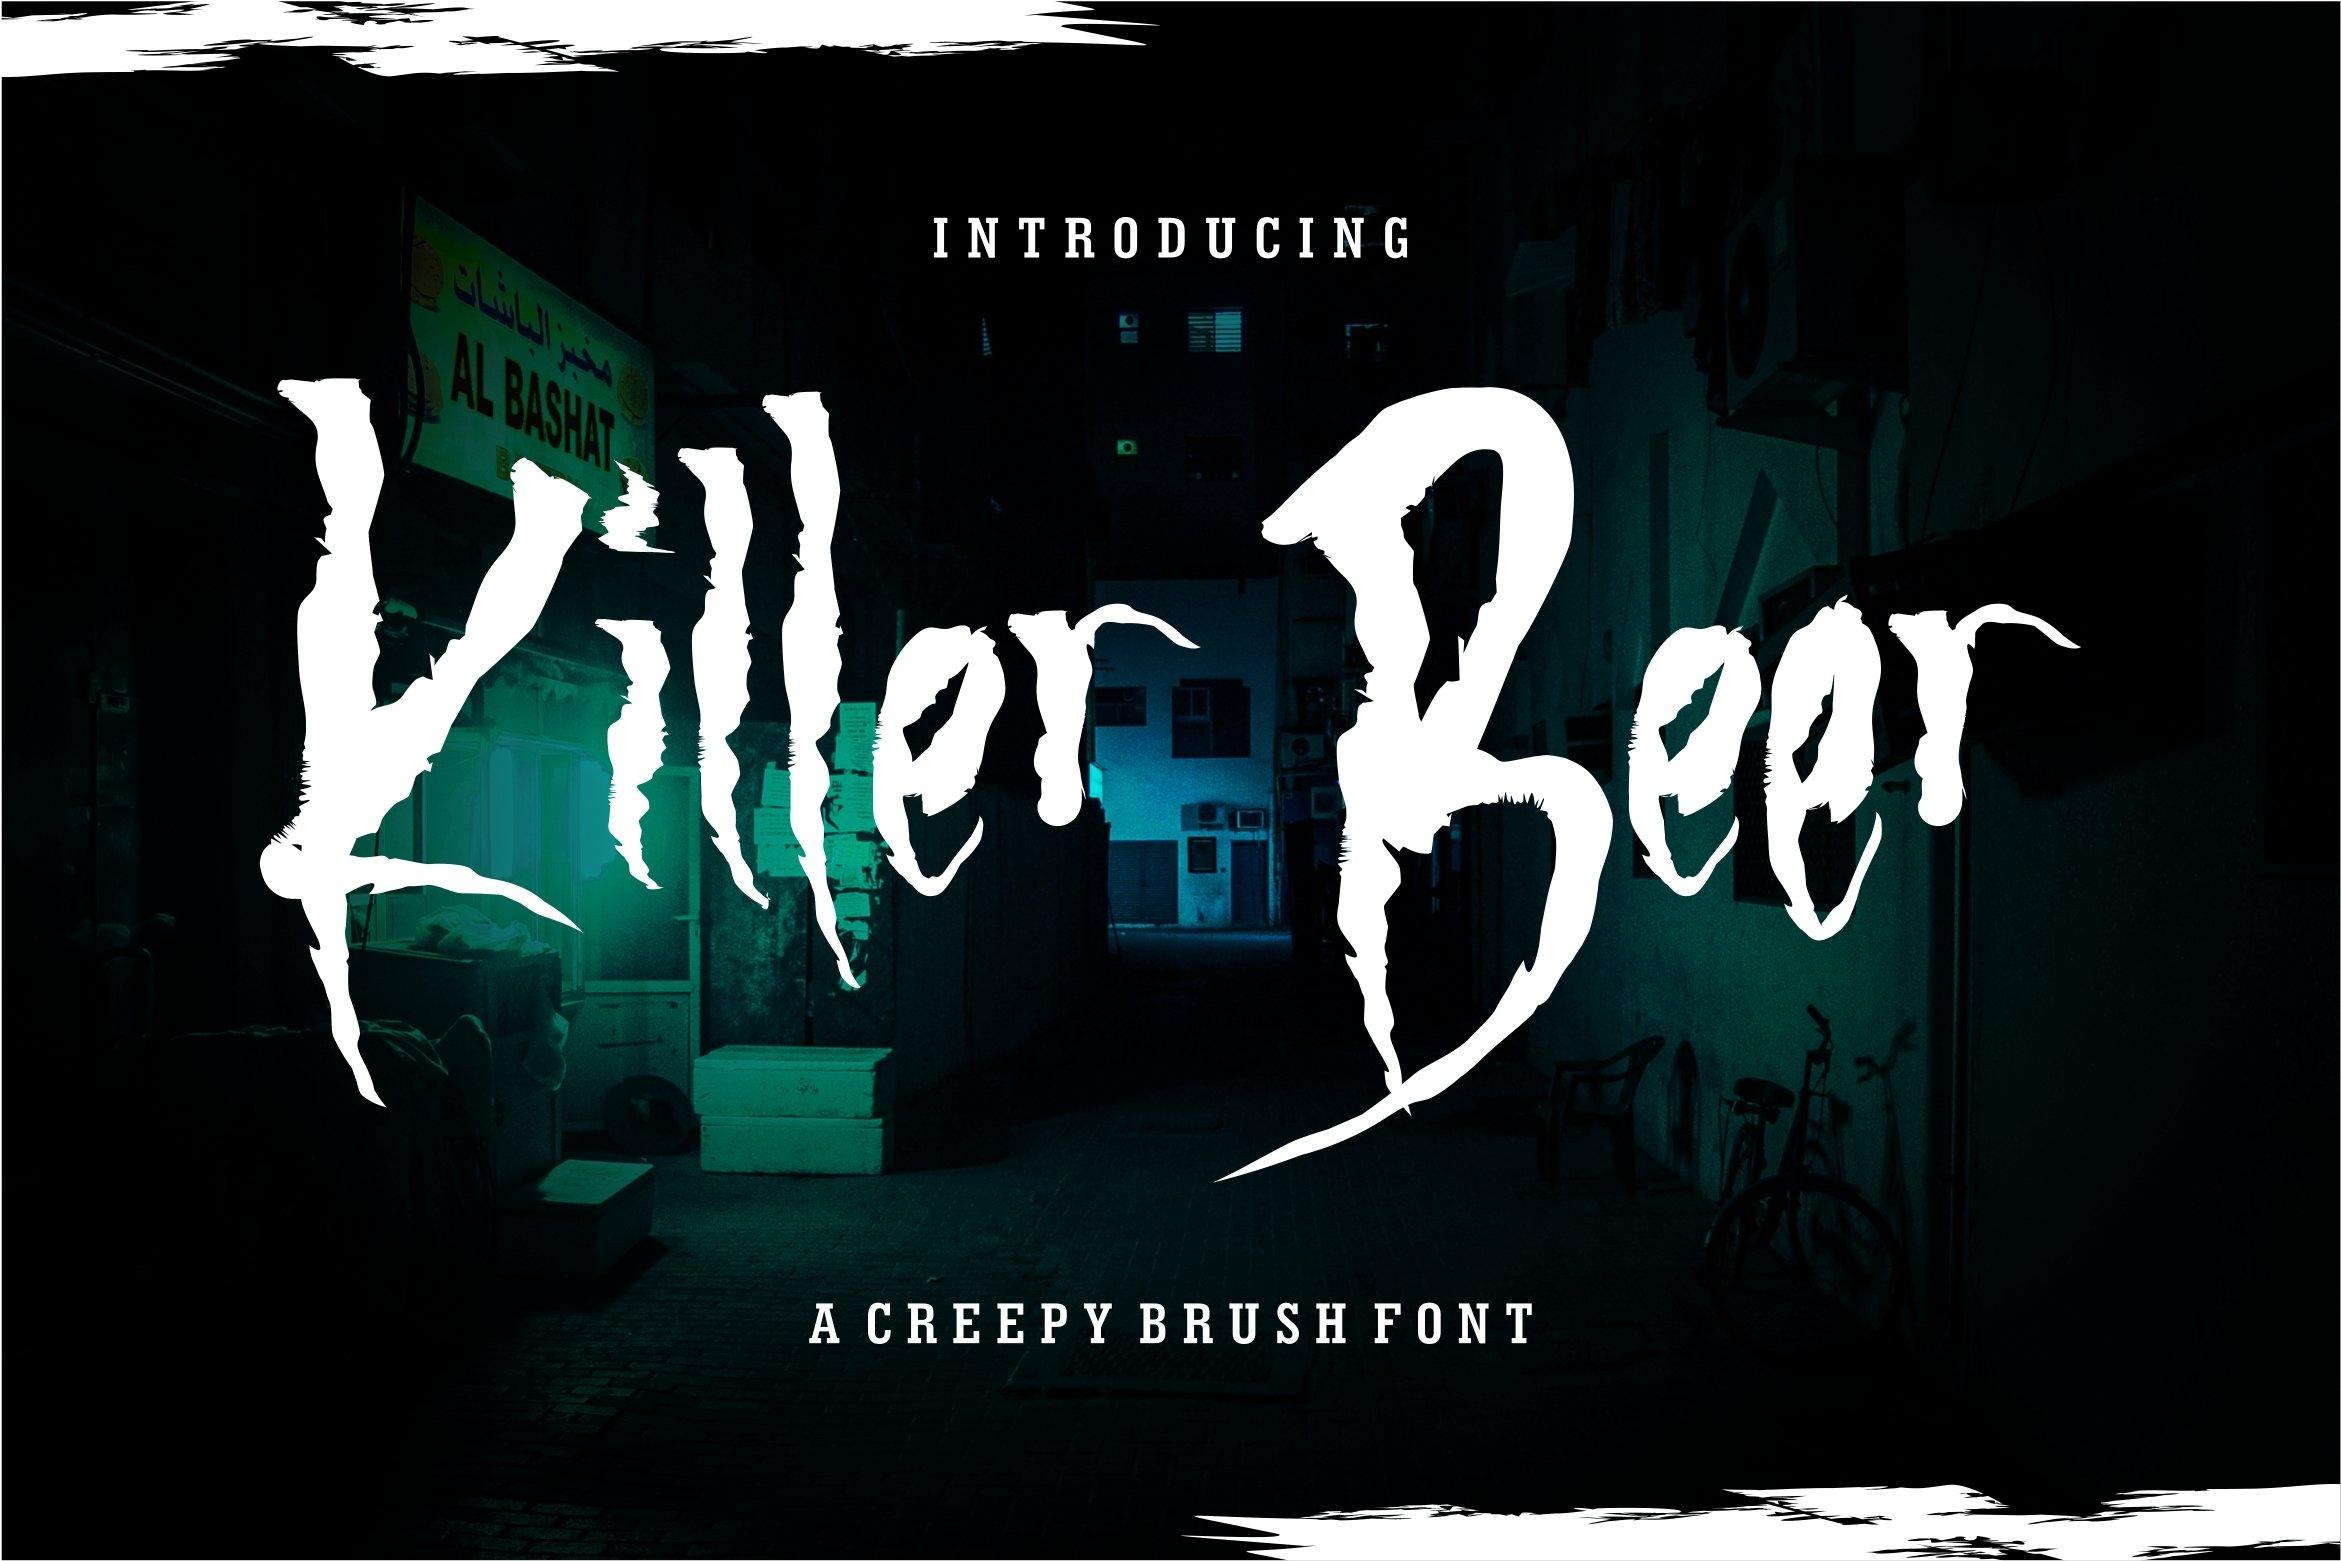 Killer Beer - A Creepy Brush Font example image 1